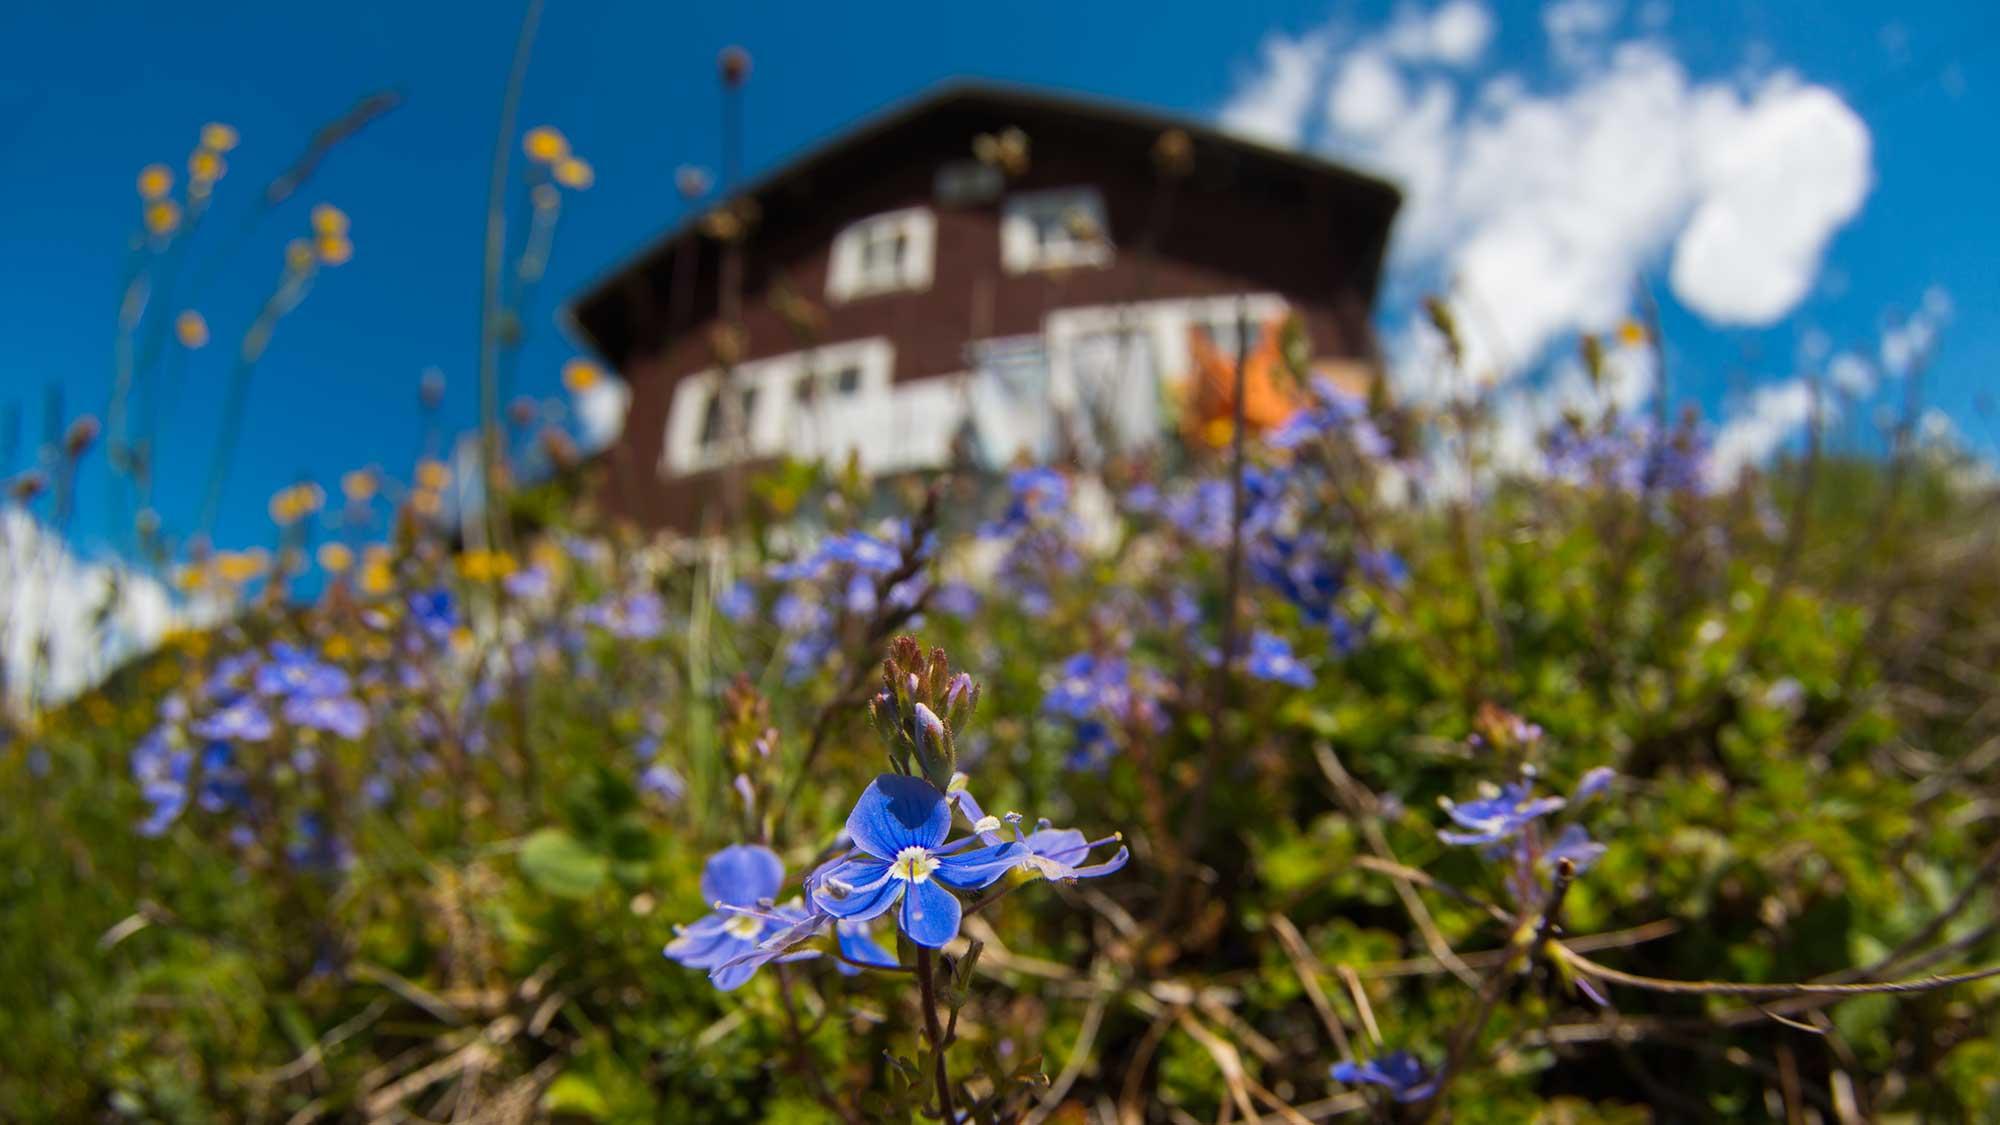 Golzerenalp, Canton Uri - Switzerland